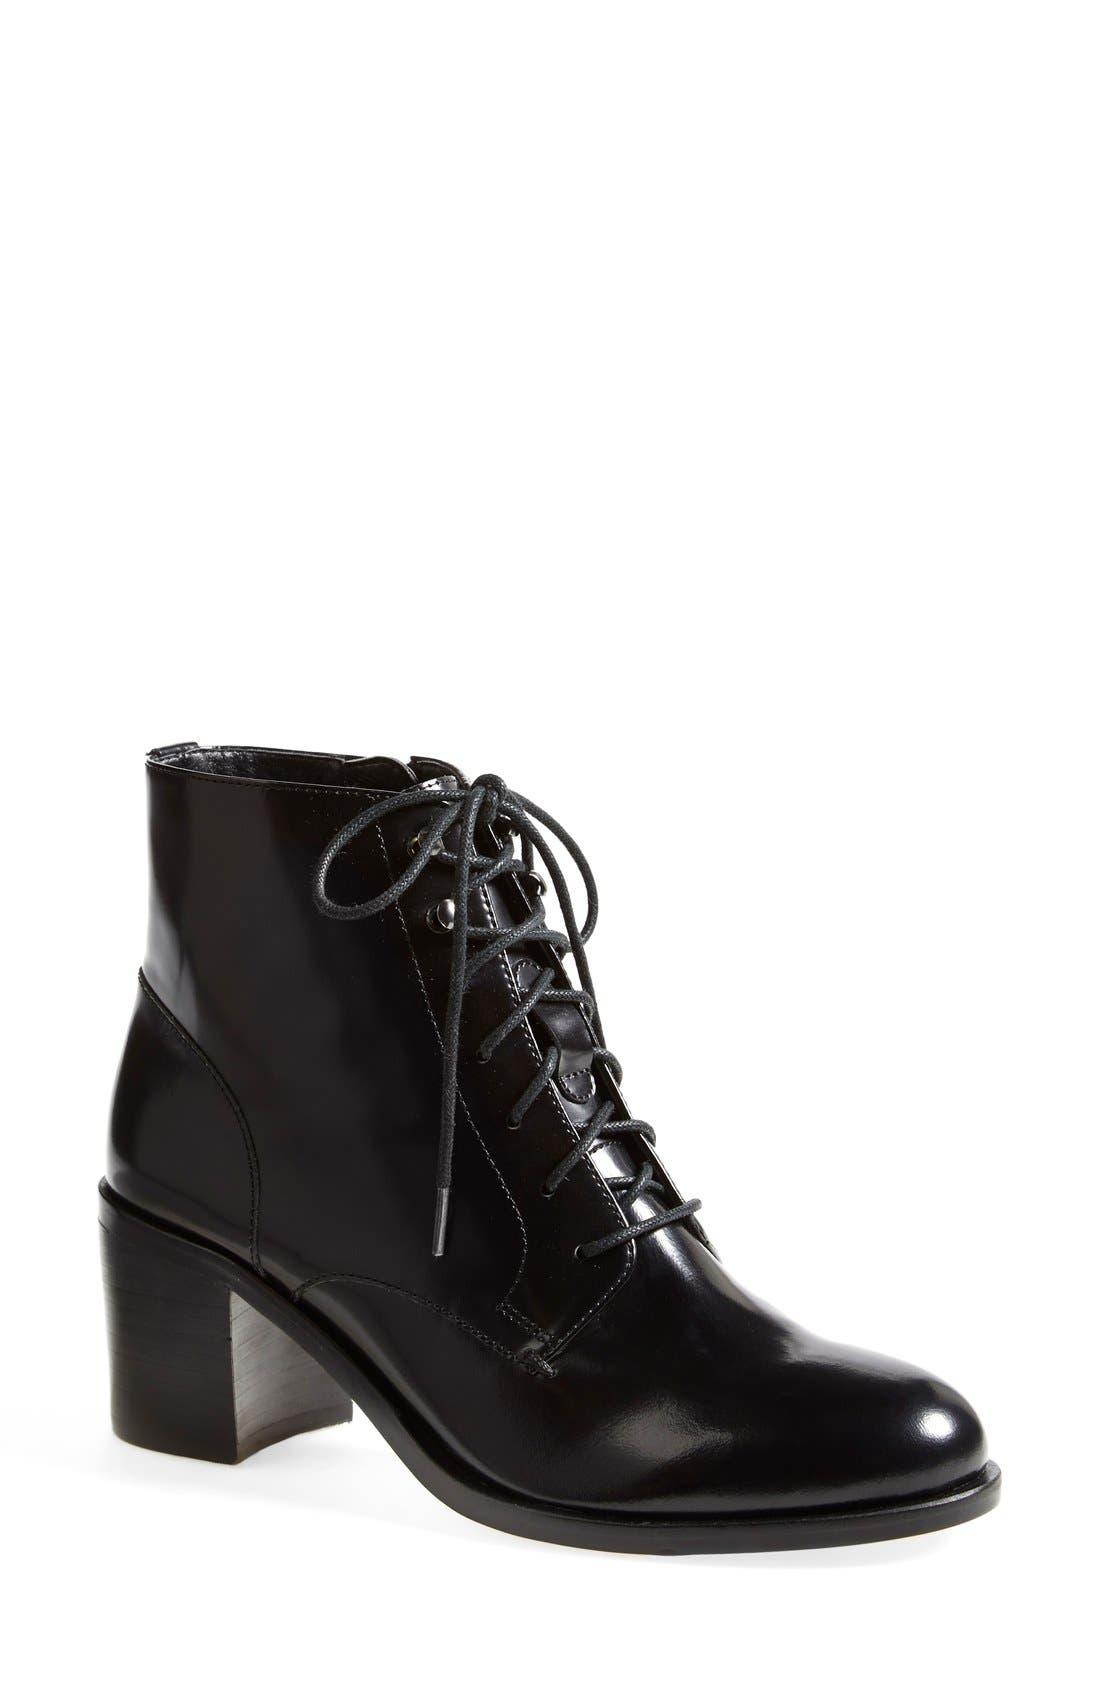 Alternate Image 1 Selected - Sam Edelman 'Jardin' Leather Bootie (Women)